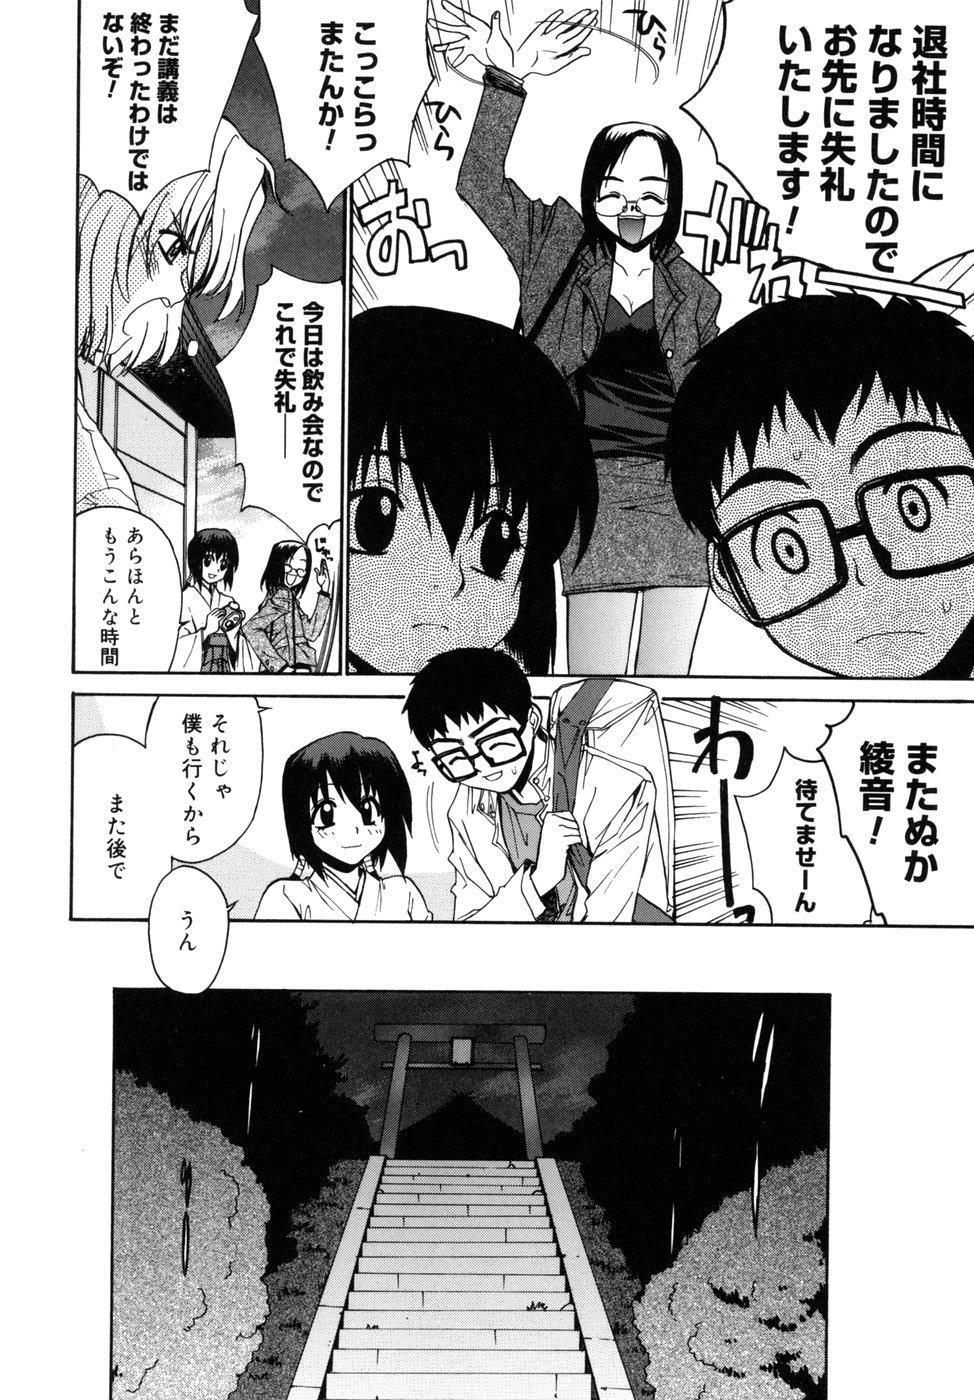 [Yaya Hinata] Tonari no Miko-san wa Minna Warau - The next shrine maidens smile in everyone. 47